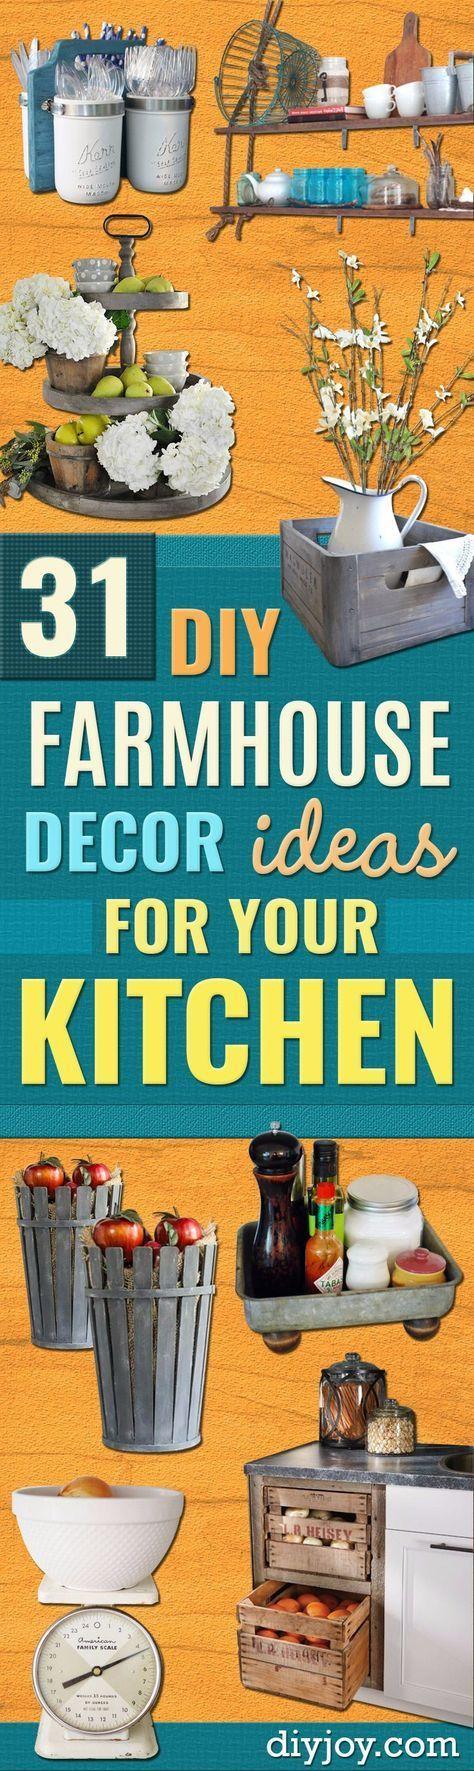 best 25 kitchen walls ideas on pinterest wood planks for walls